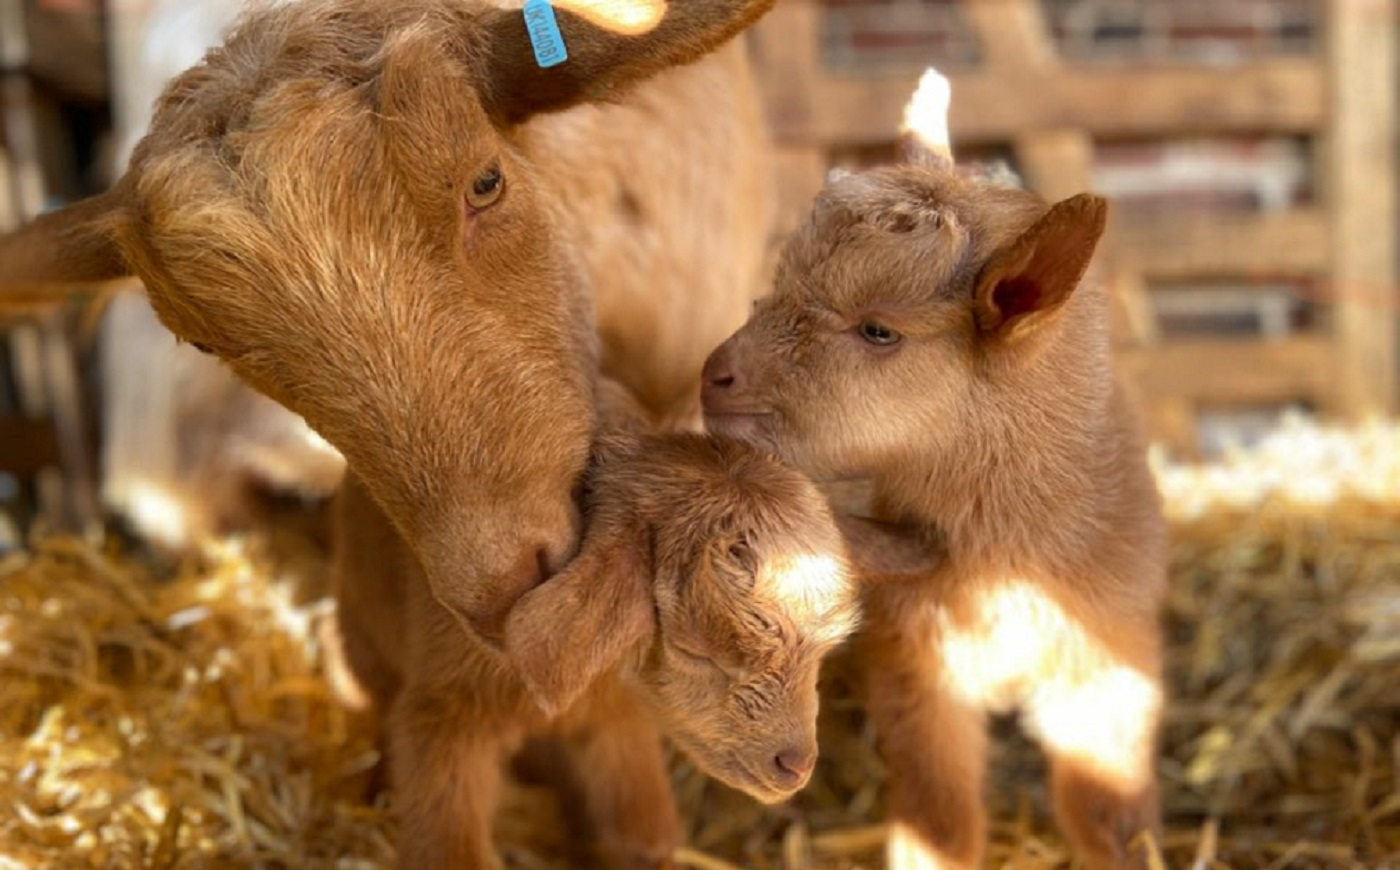 Visit our Rare Breed Farm Park